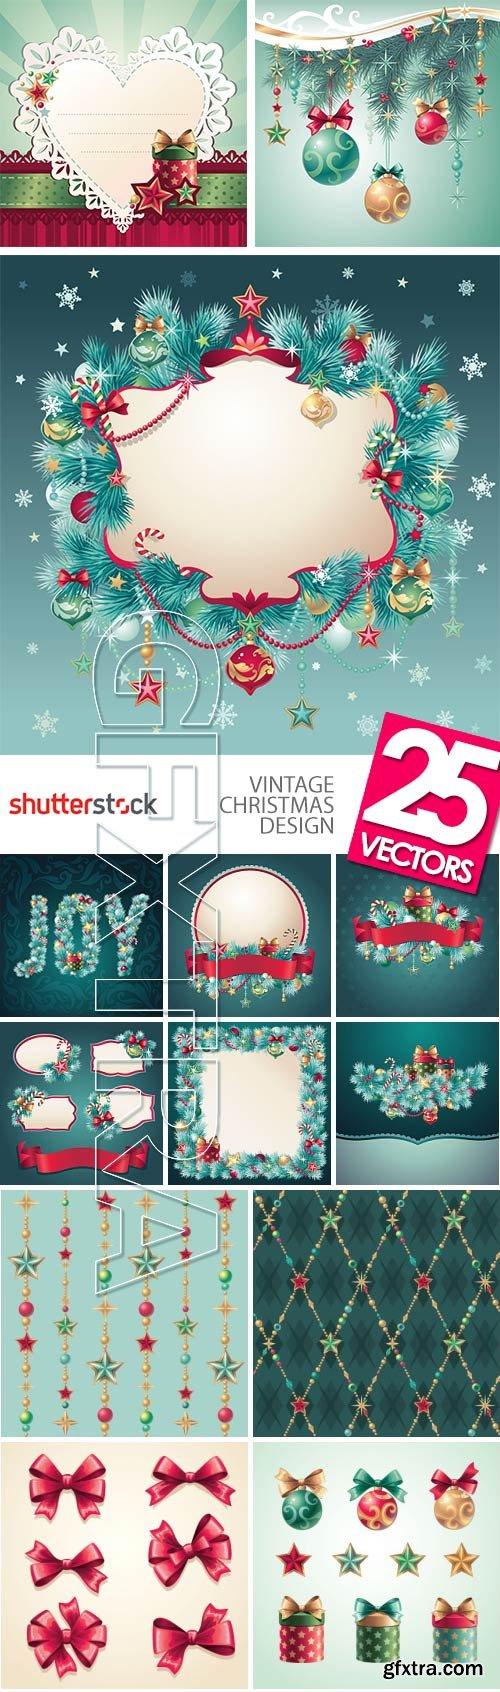 Vintage Christmas Design 25xEPS